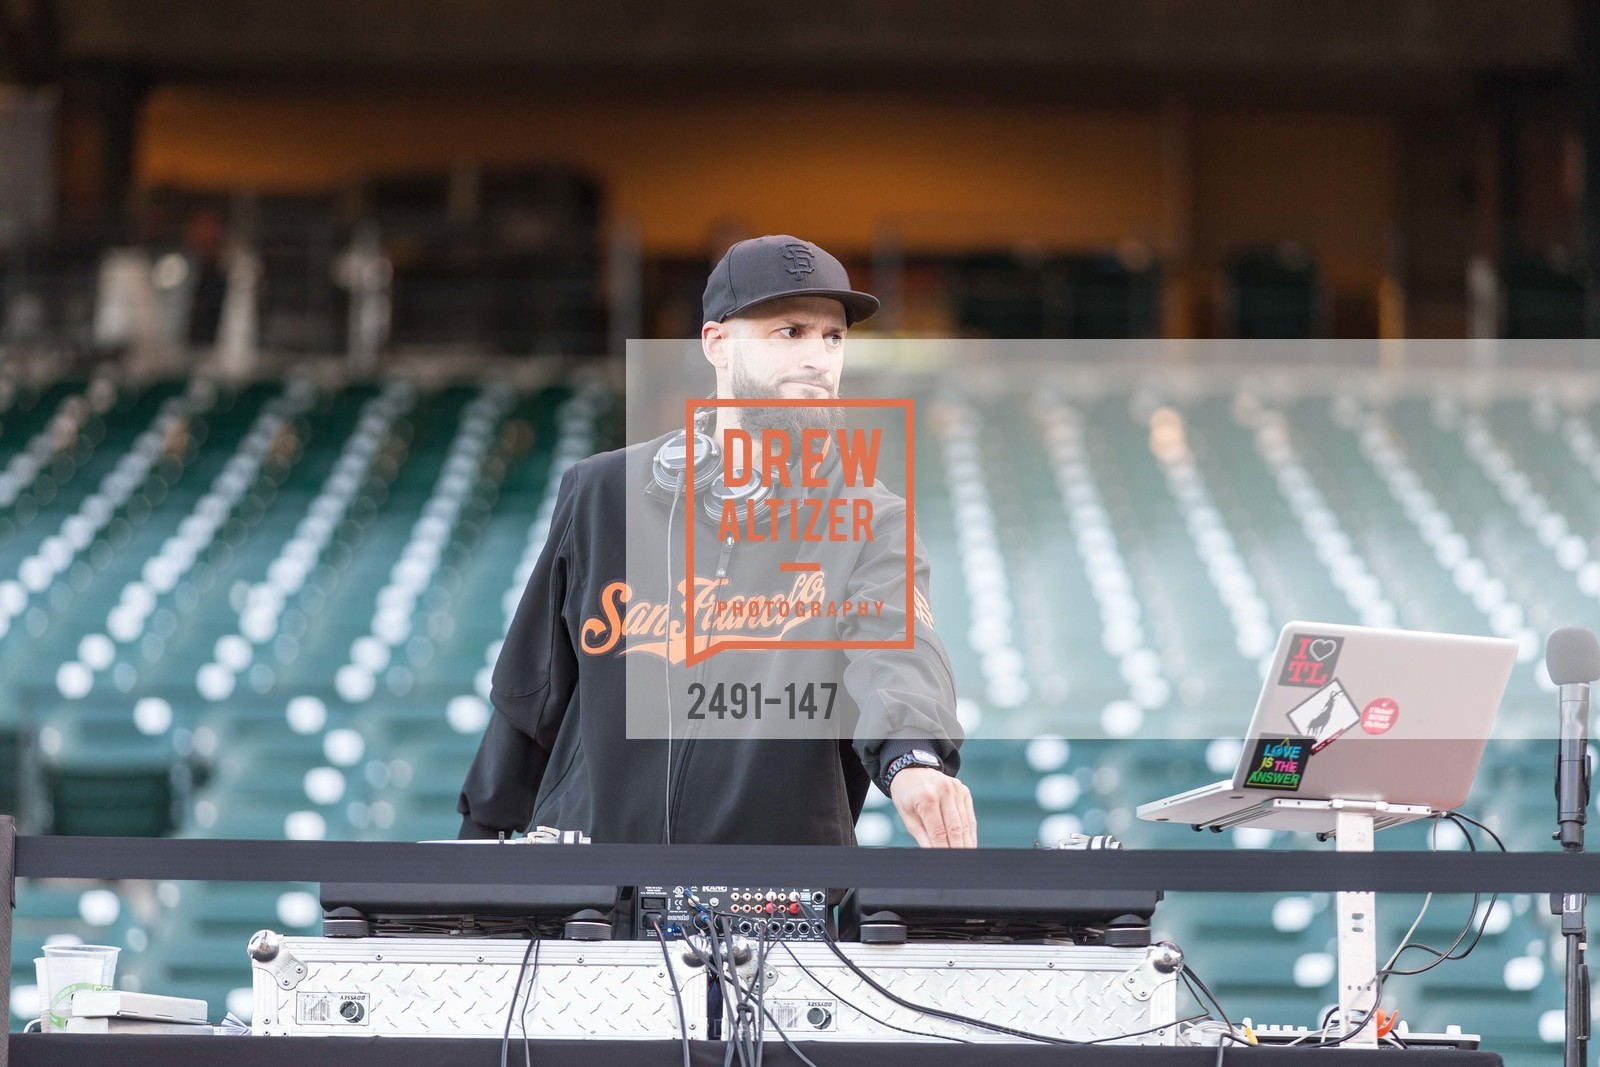 DJ Everett, The Saint Francis Foundation's